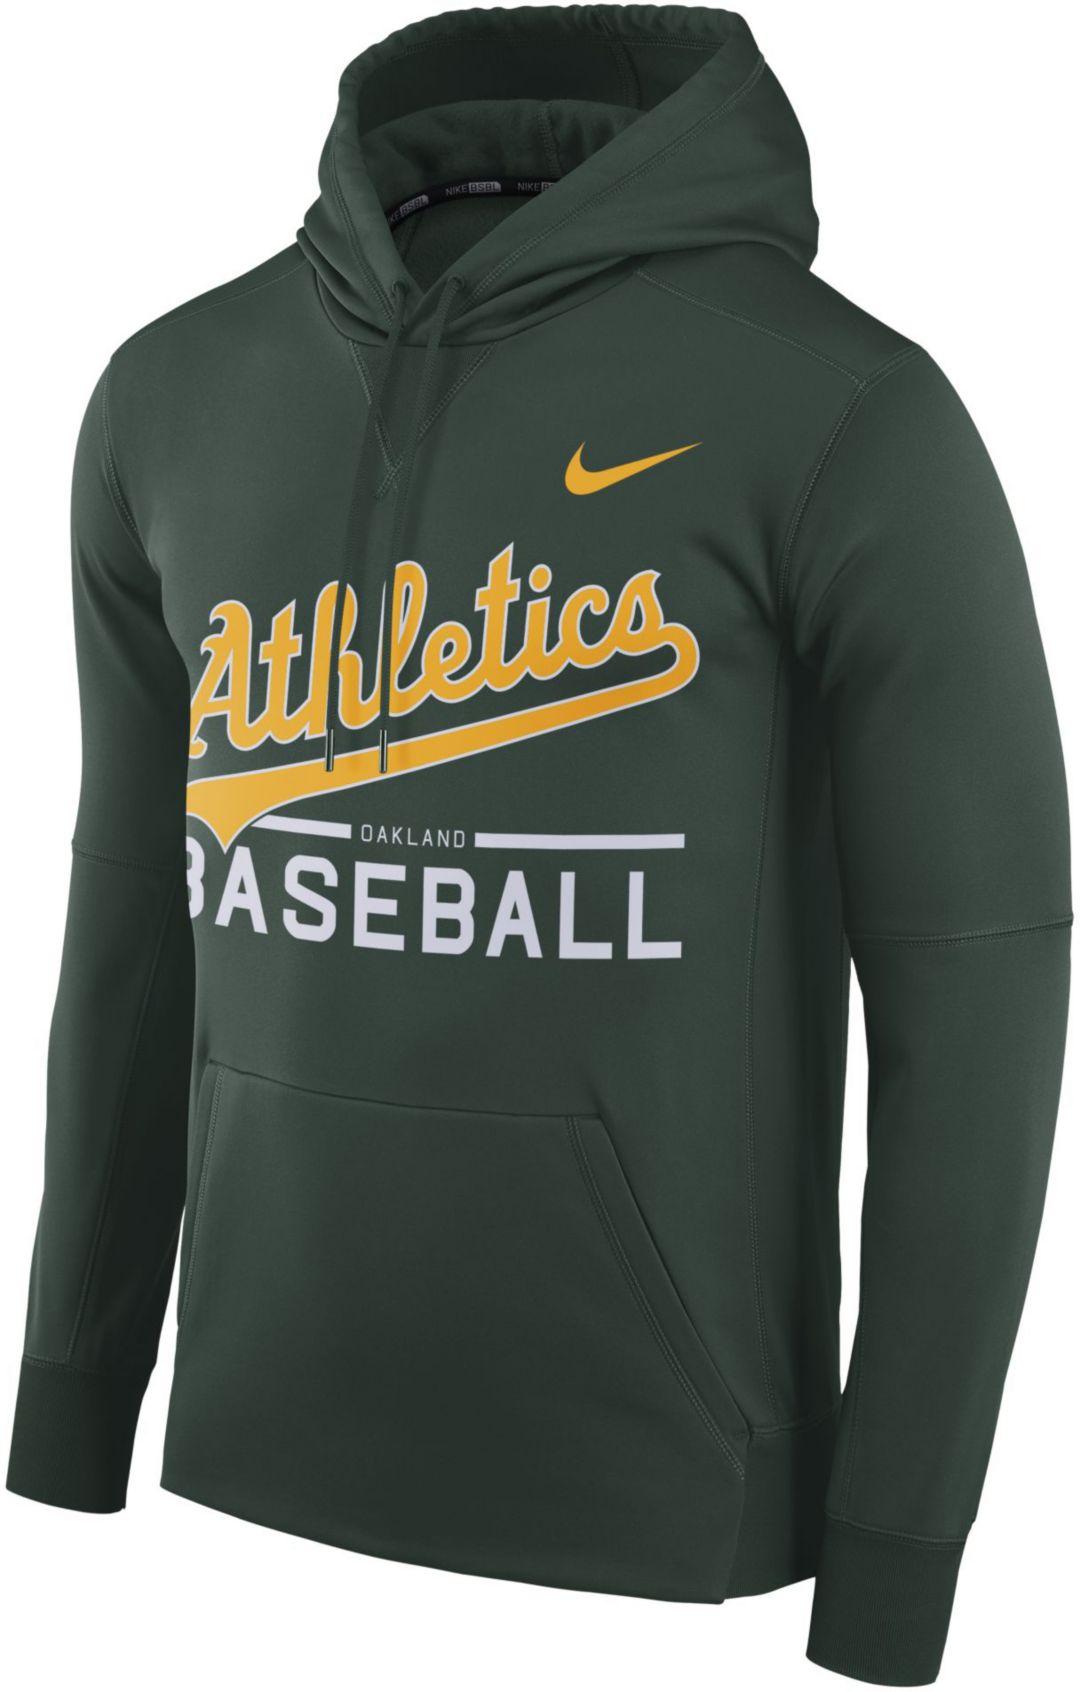 2cda25ee80 Nike Men's Oakland Athletics Pullover Hoodie